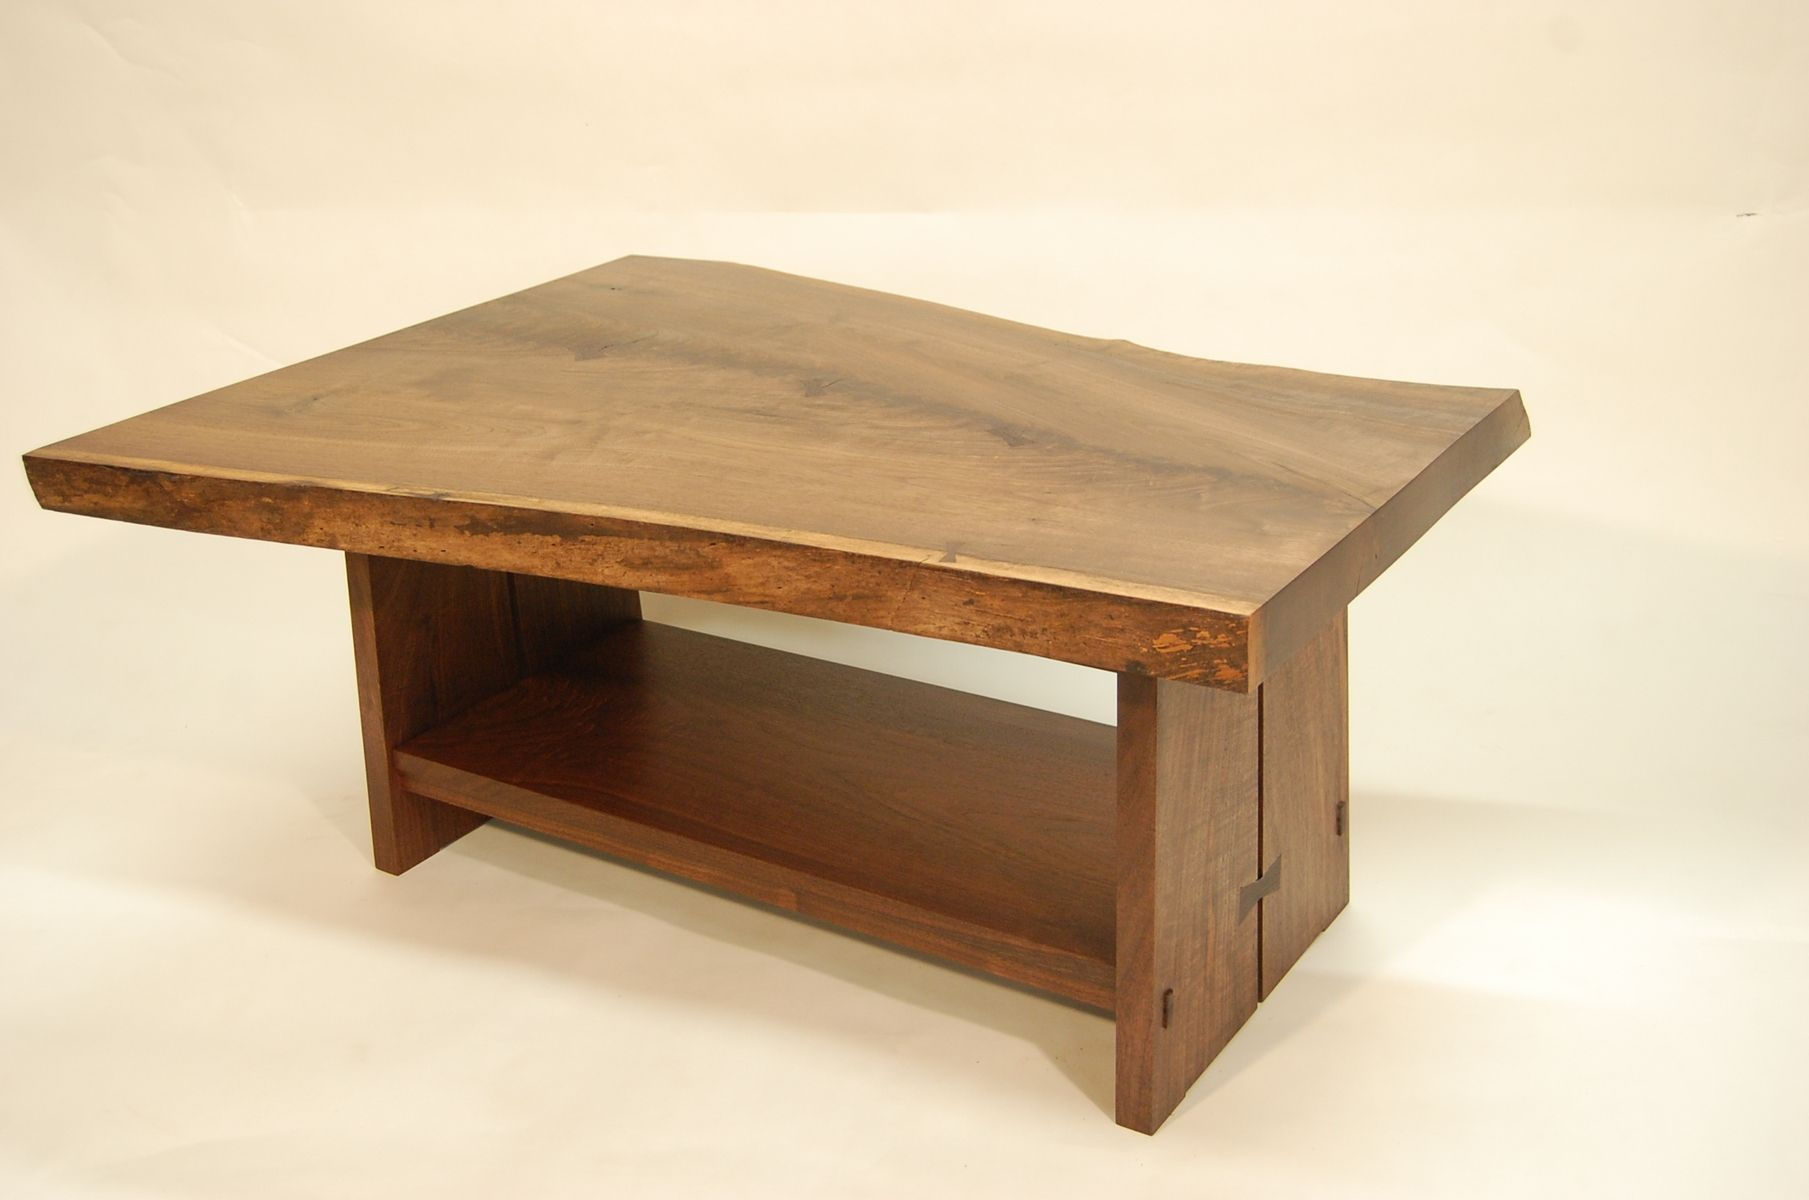 custom made black walnut coffee table by myrtle grove. Black Bedroom Furniture Sets. Home Design Ideas